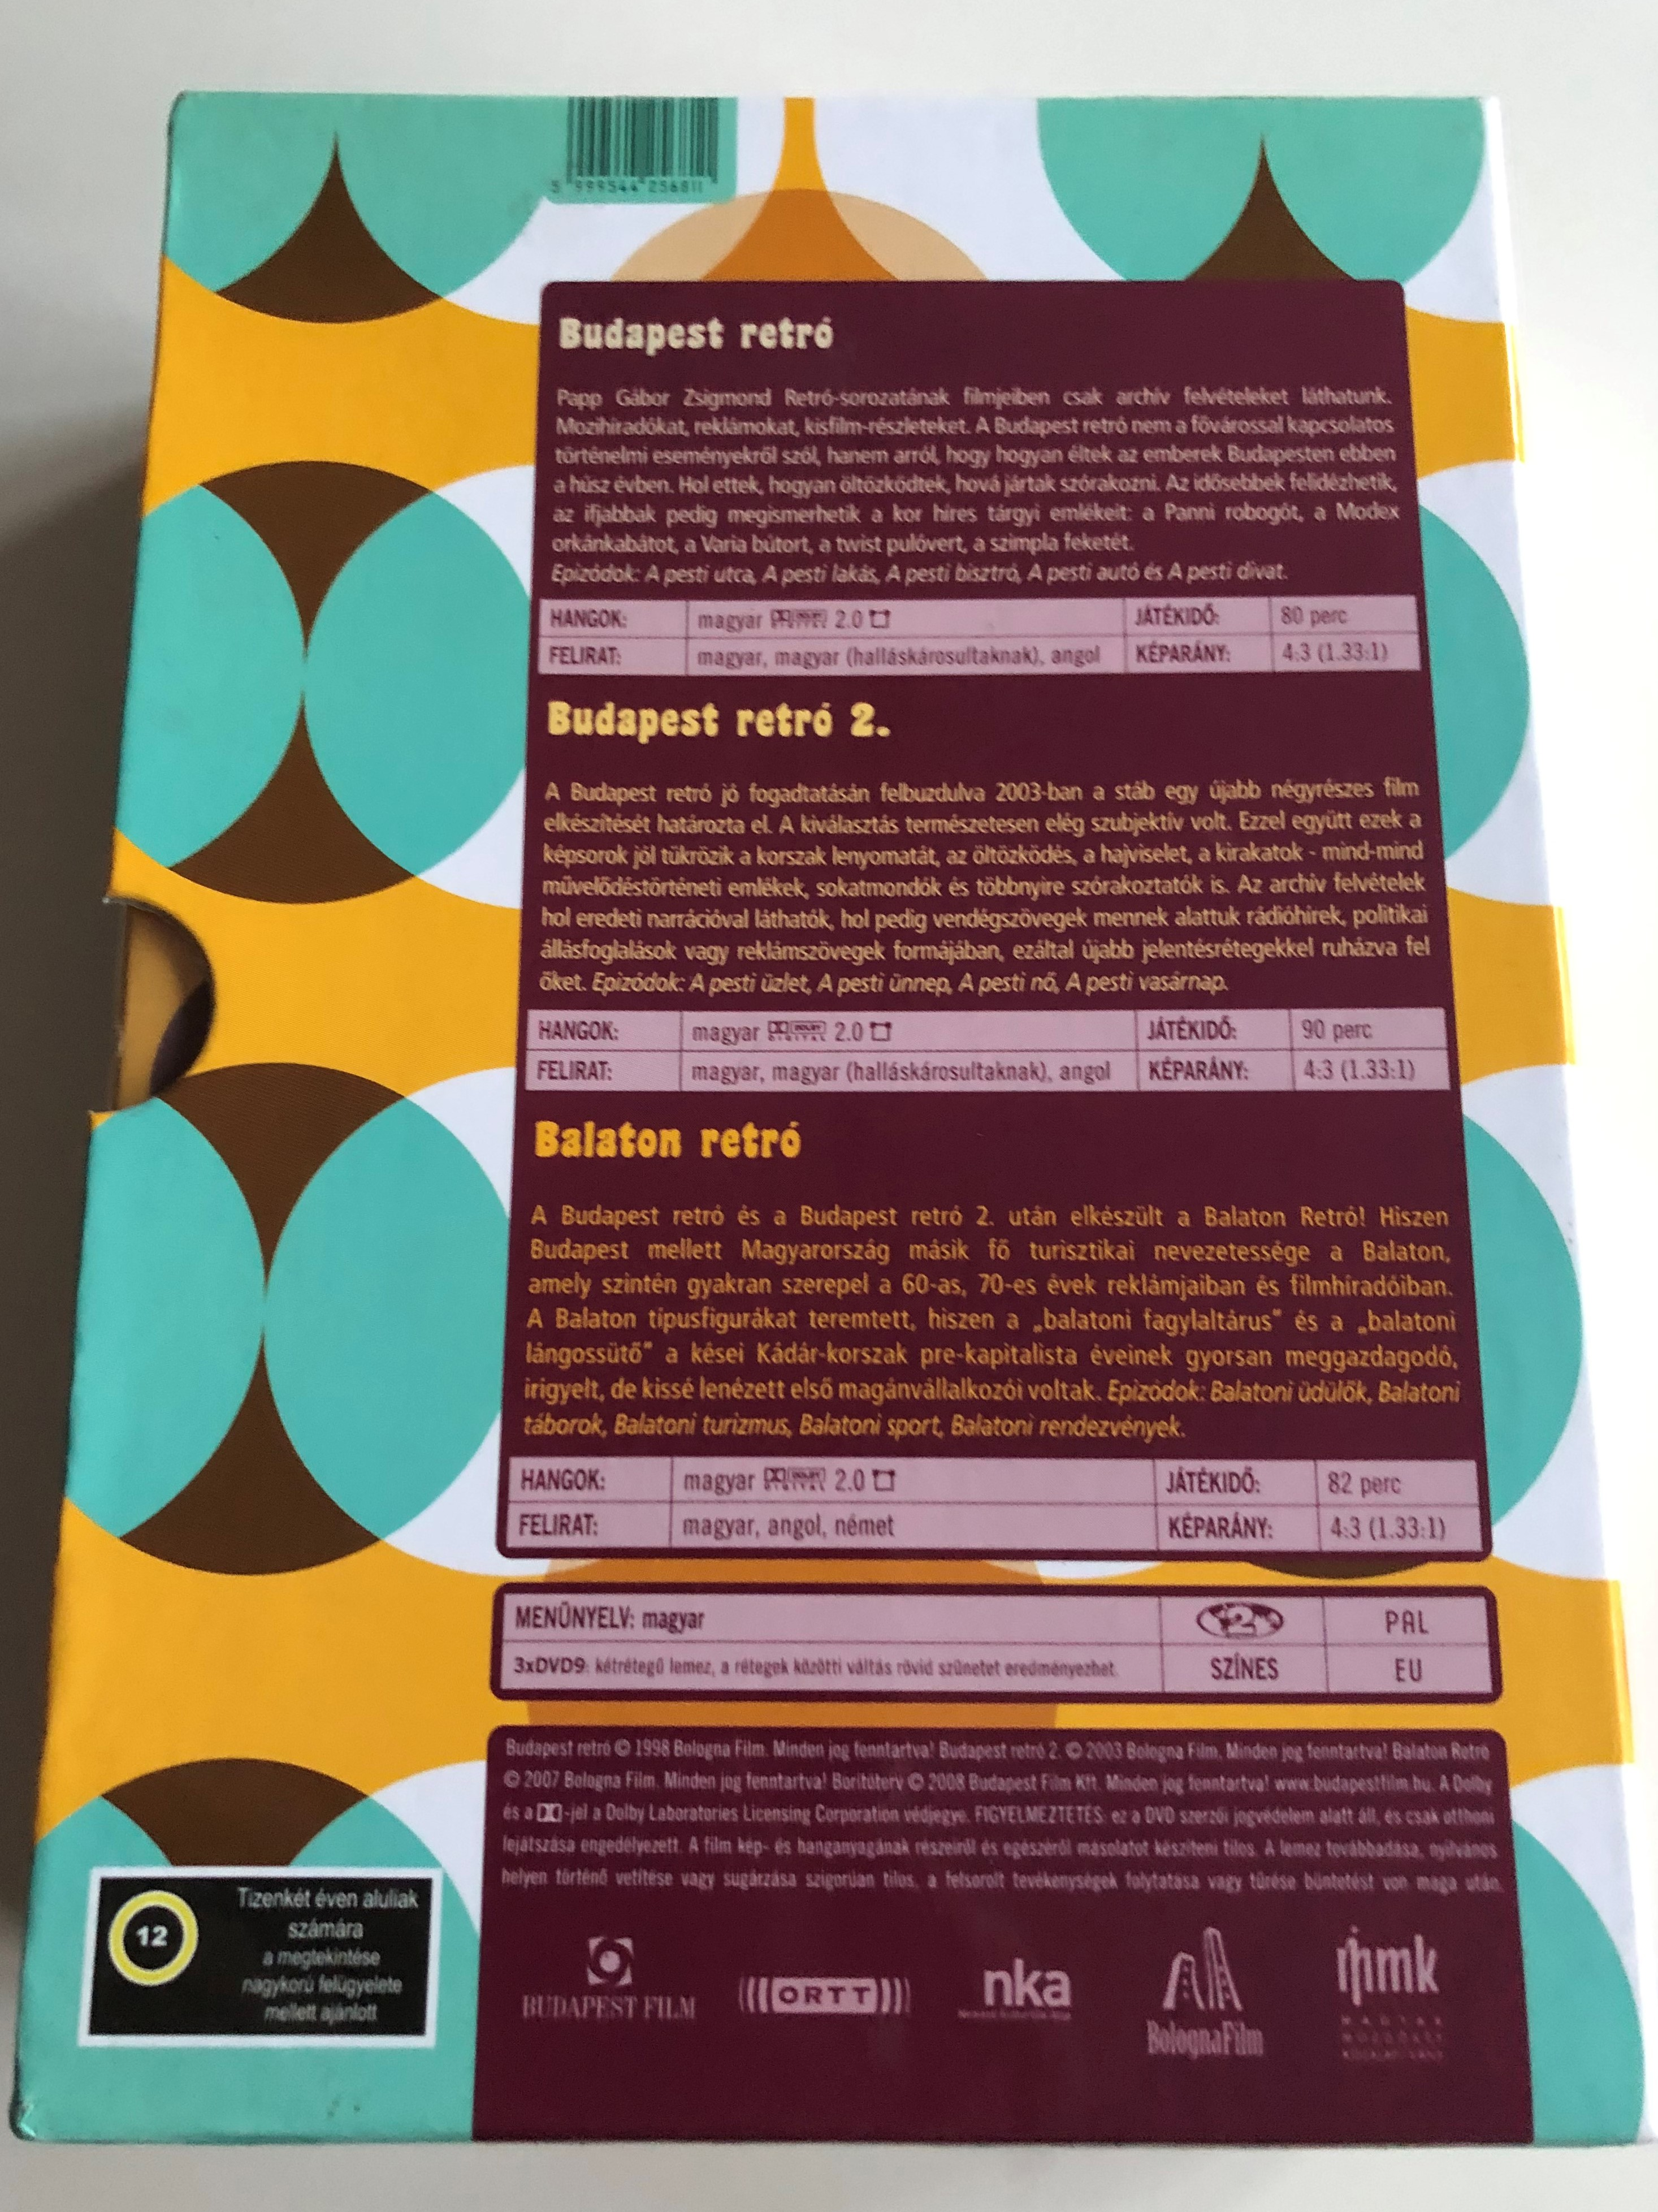 retr-d-szdoboz-dvd-box-papp-g-bor-zsigmond-retr-sorozata-3.jpg